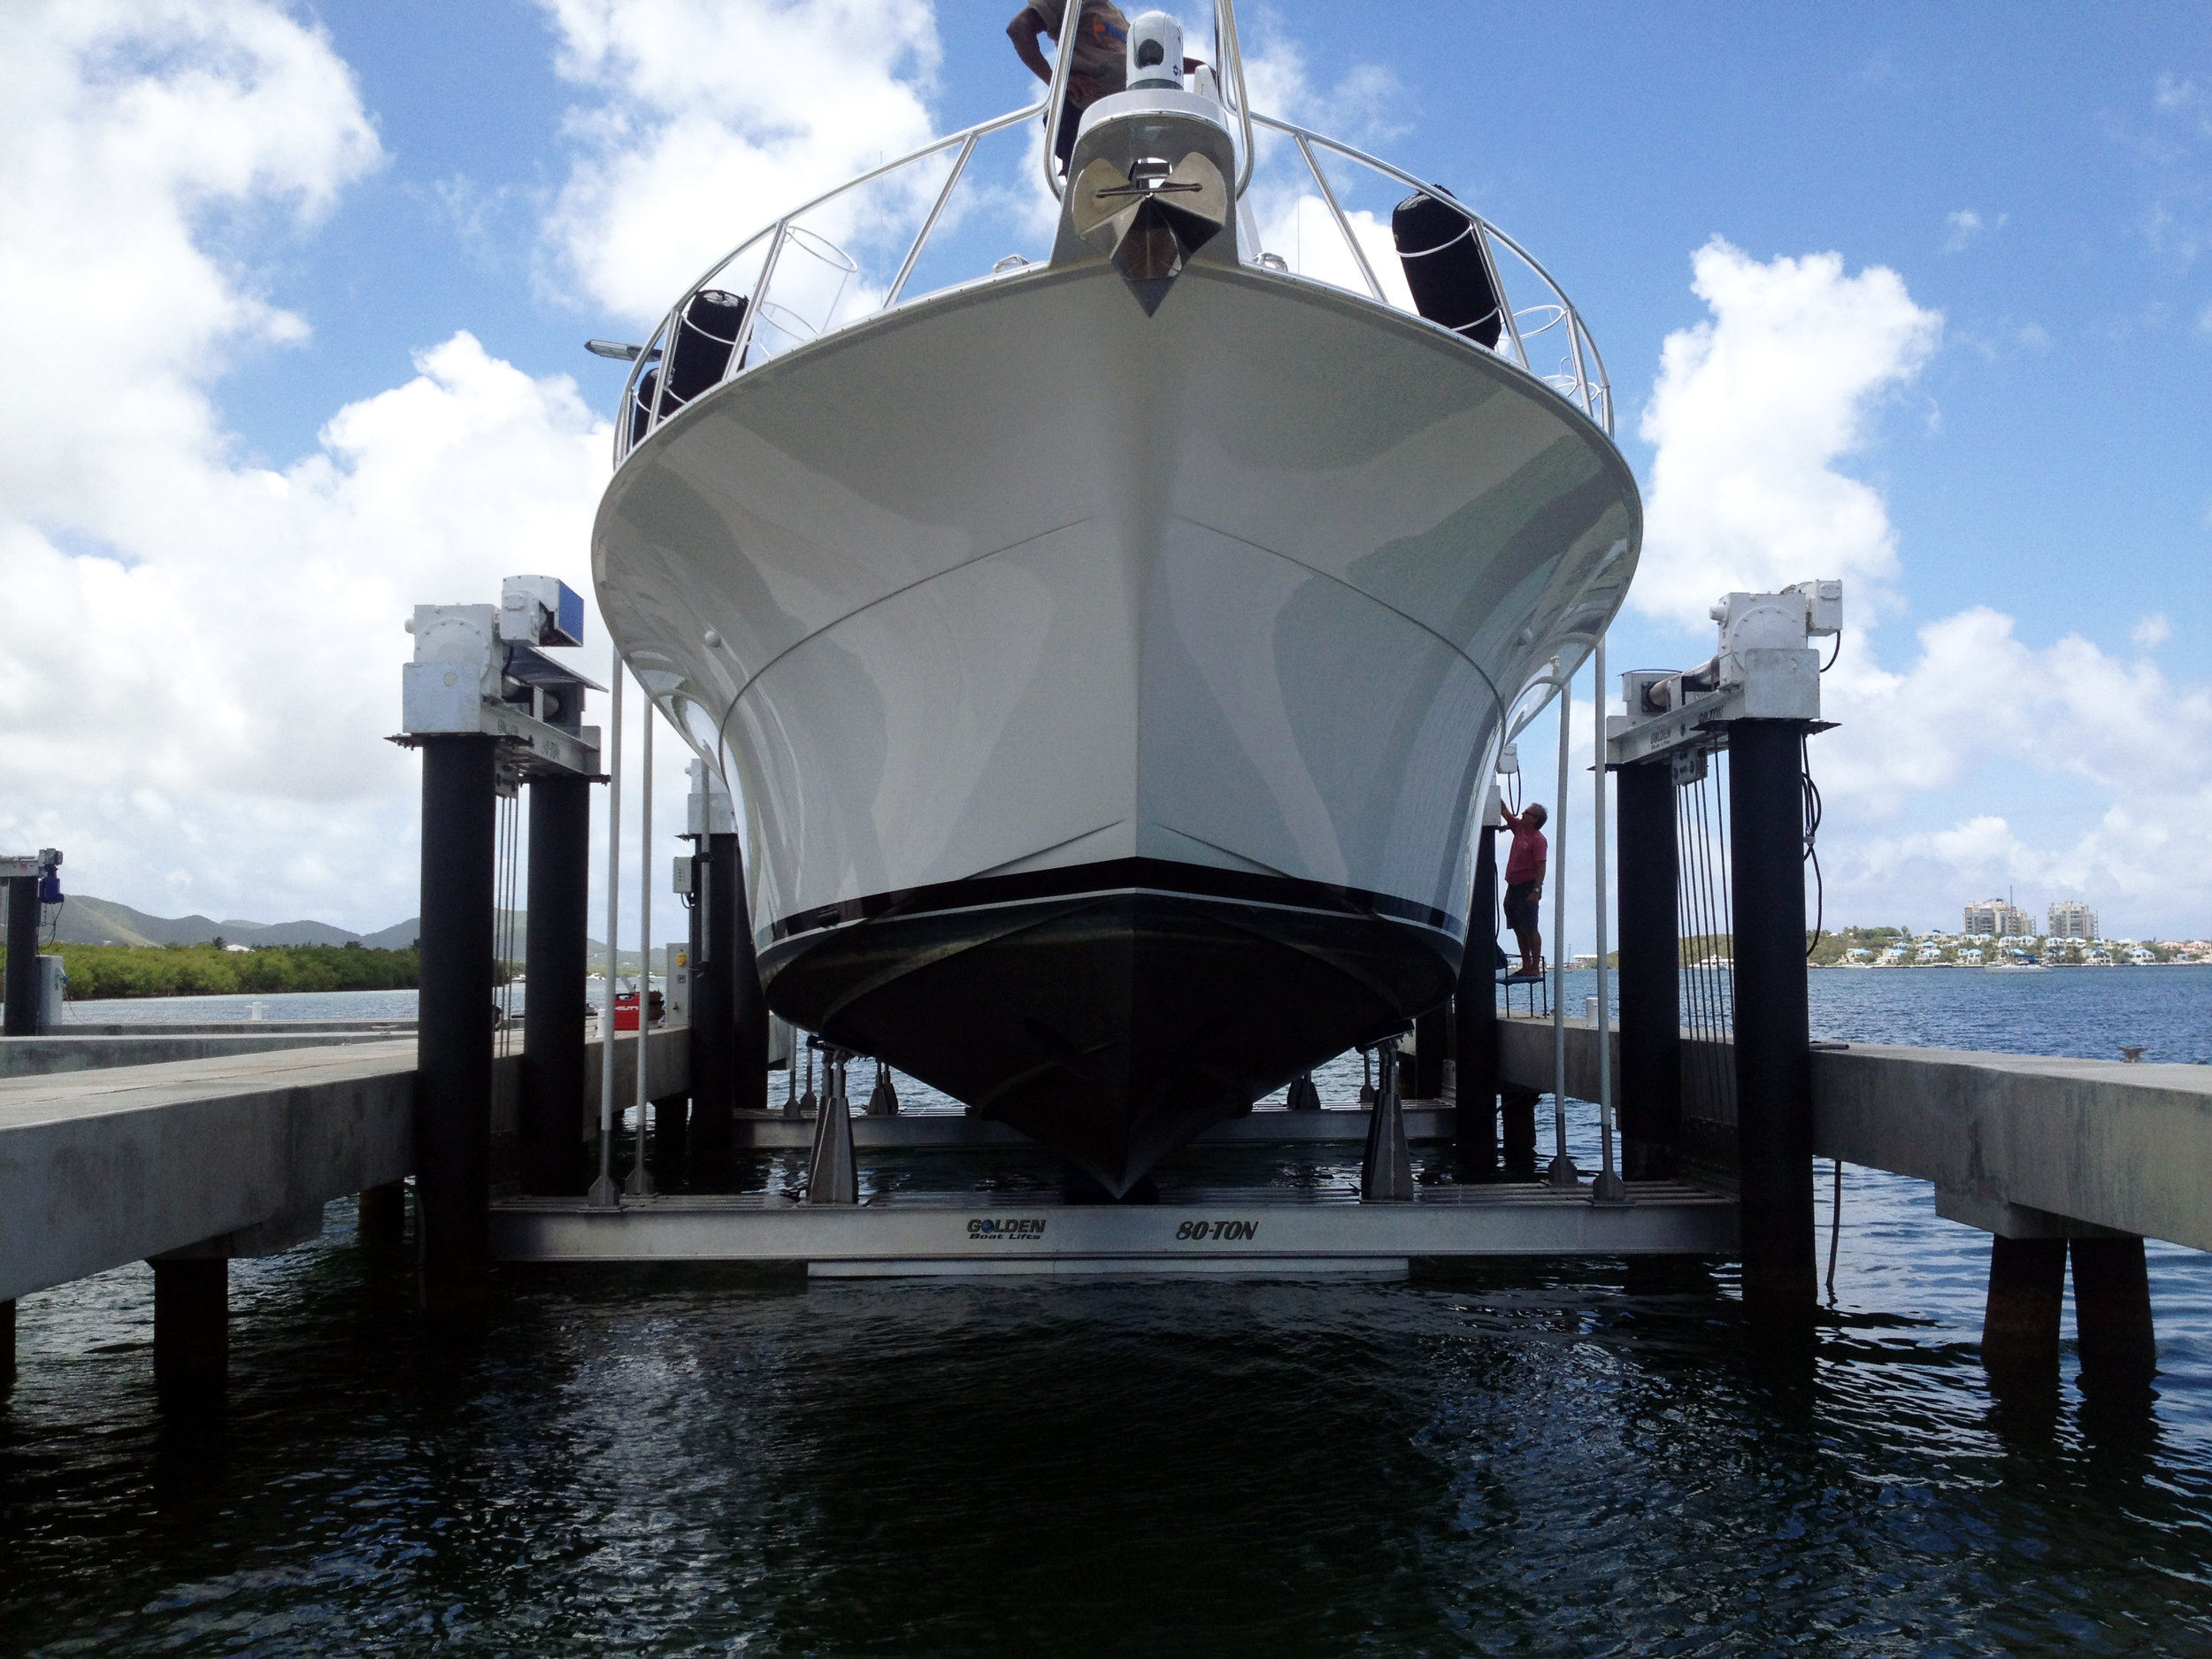 boat lift, boathouse lift, bootlift, boot lift, boatlifting systems, 8-post, bootslift, schiffshebewerk, bådehus lift, båd elevatorer, båd lift, elevador marítimo, boatlift, elevador de barcos